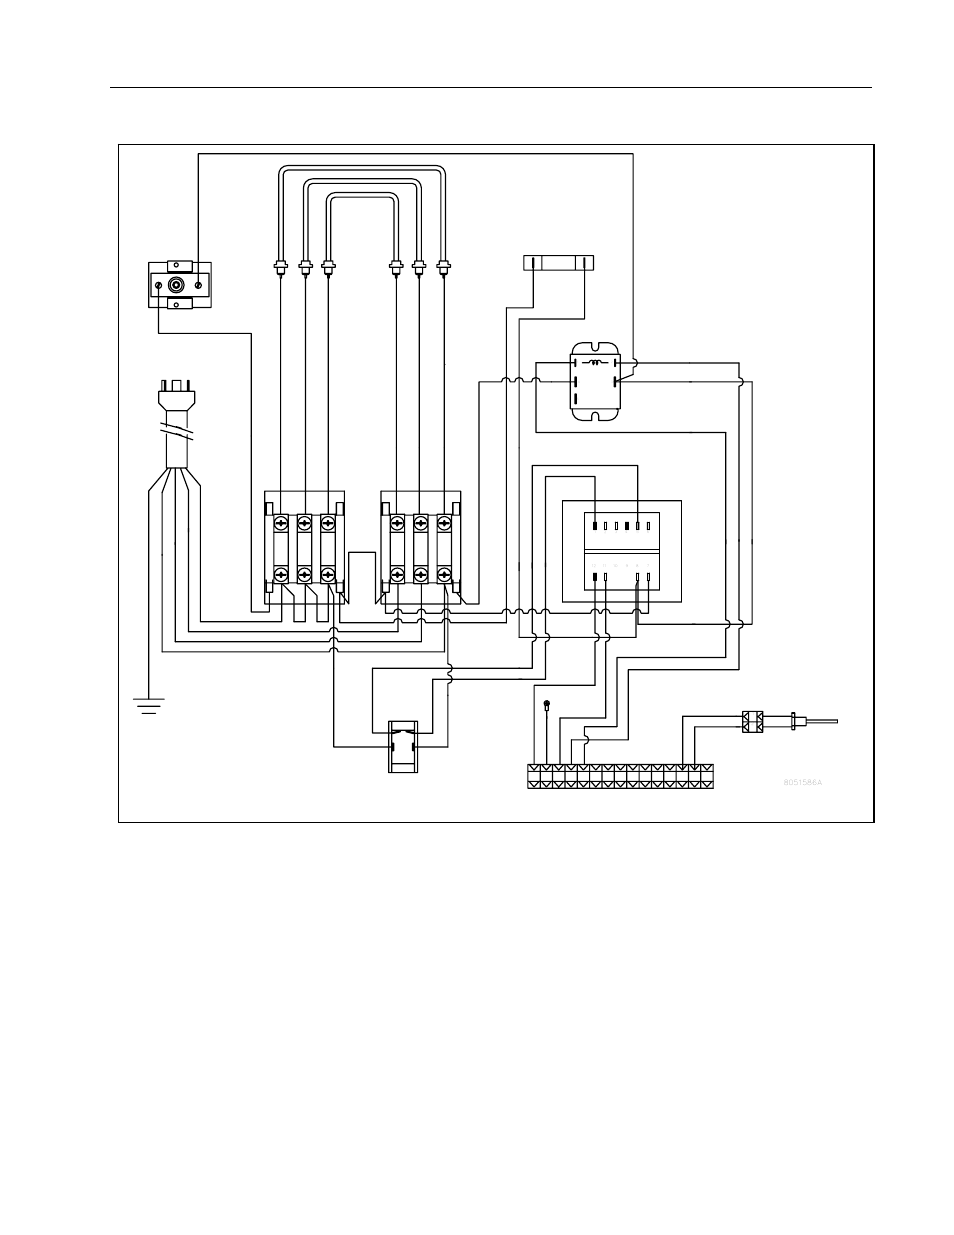 medium resolution of frymaster wiring diagram wiring diagrams loop wiring diagram frymaster wiring diagram